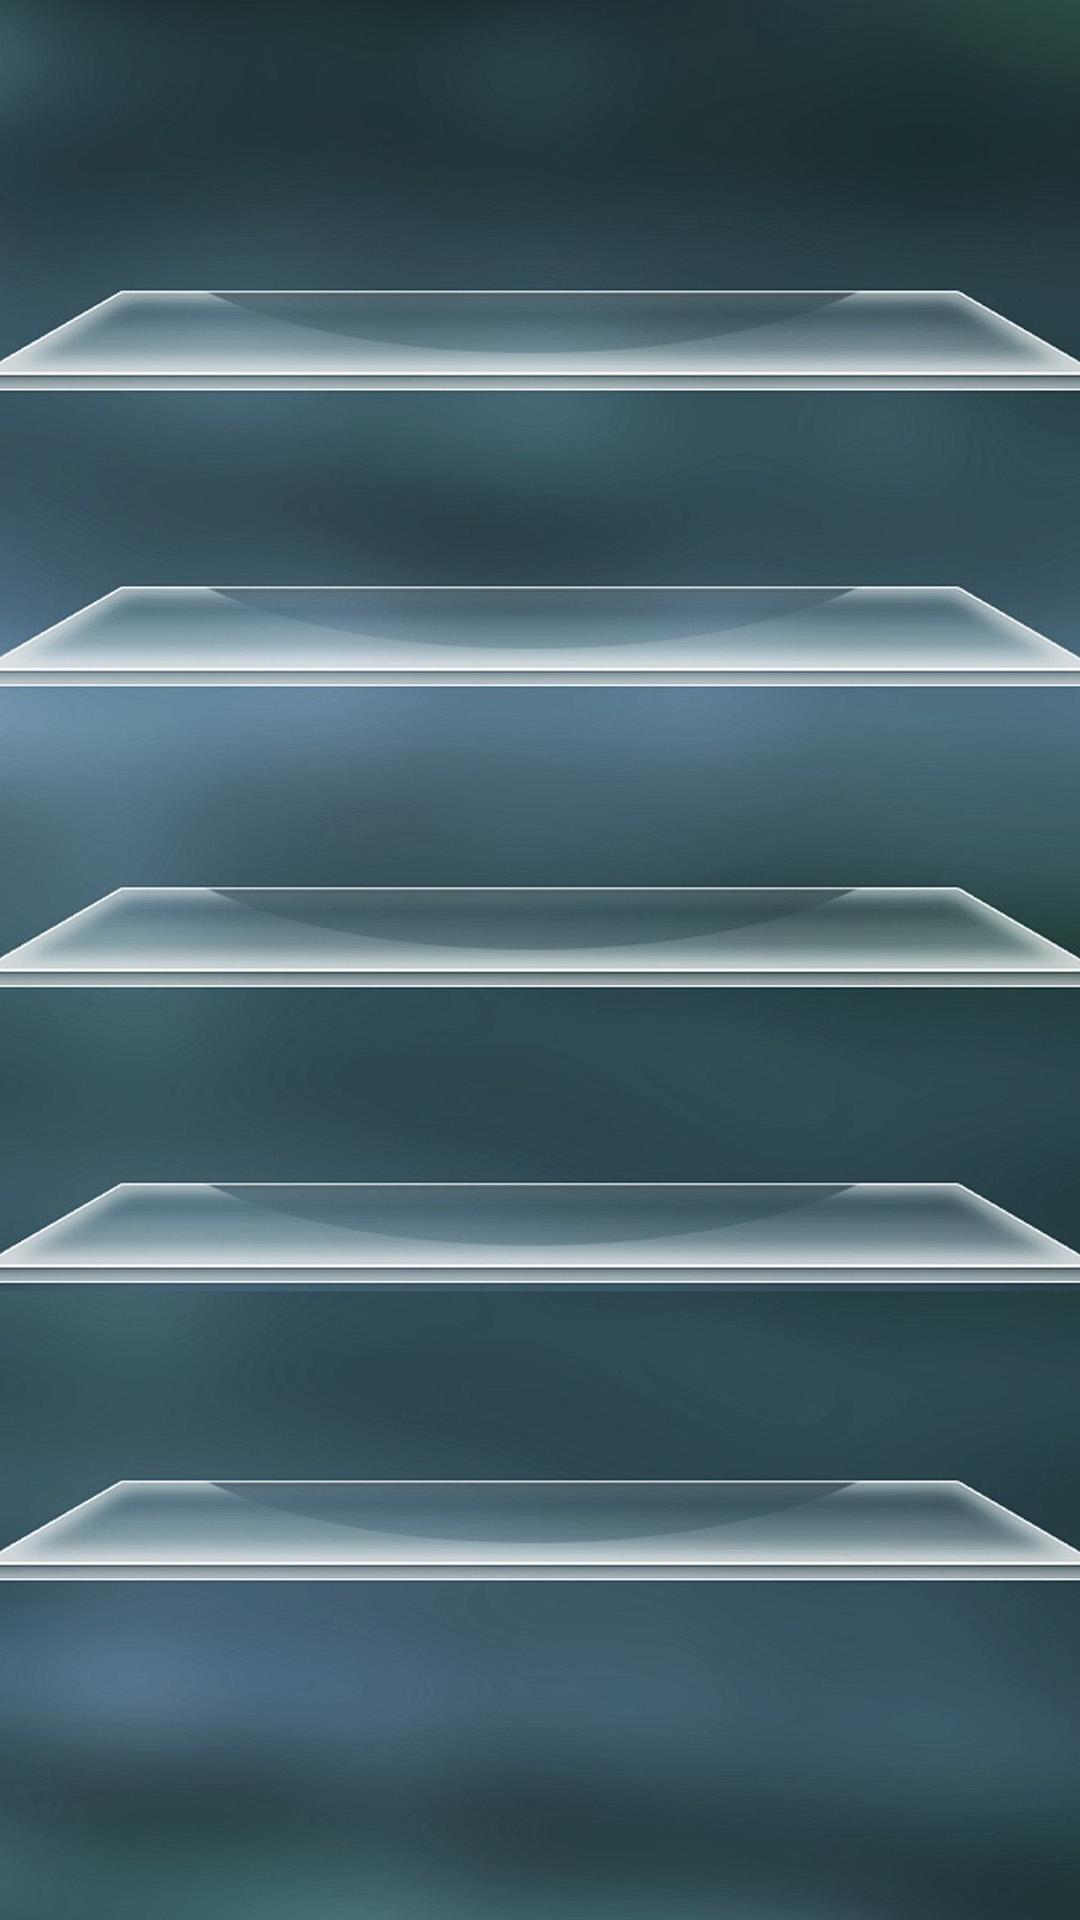 Shelf IPhone 6 Plus Wallpaper 87 Wallpapers HD 1080x1920